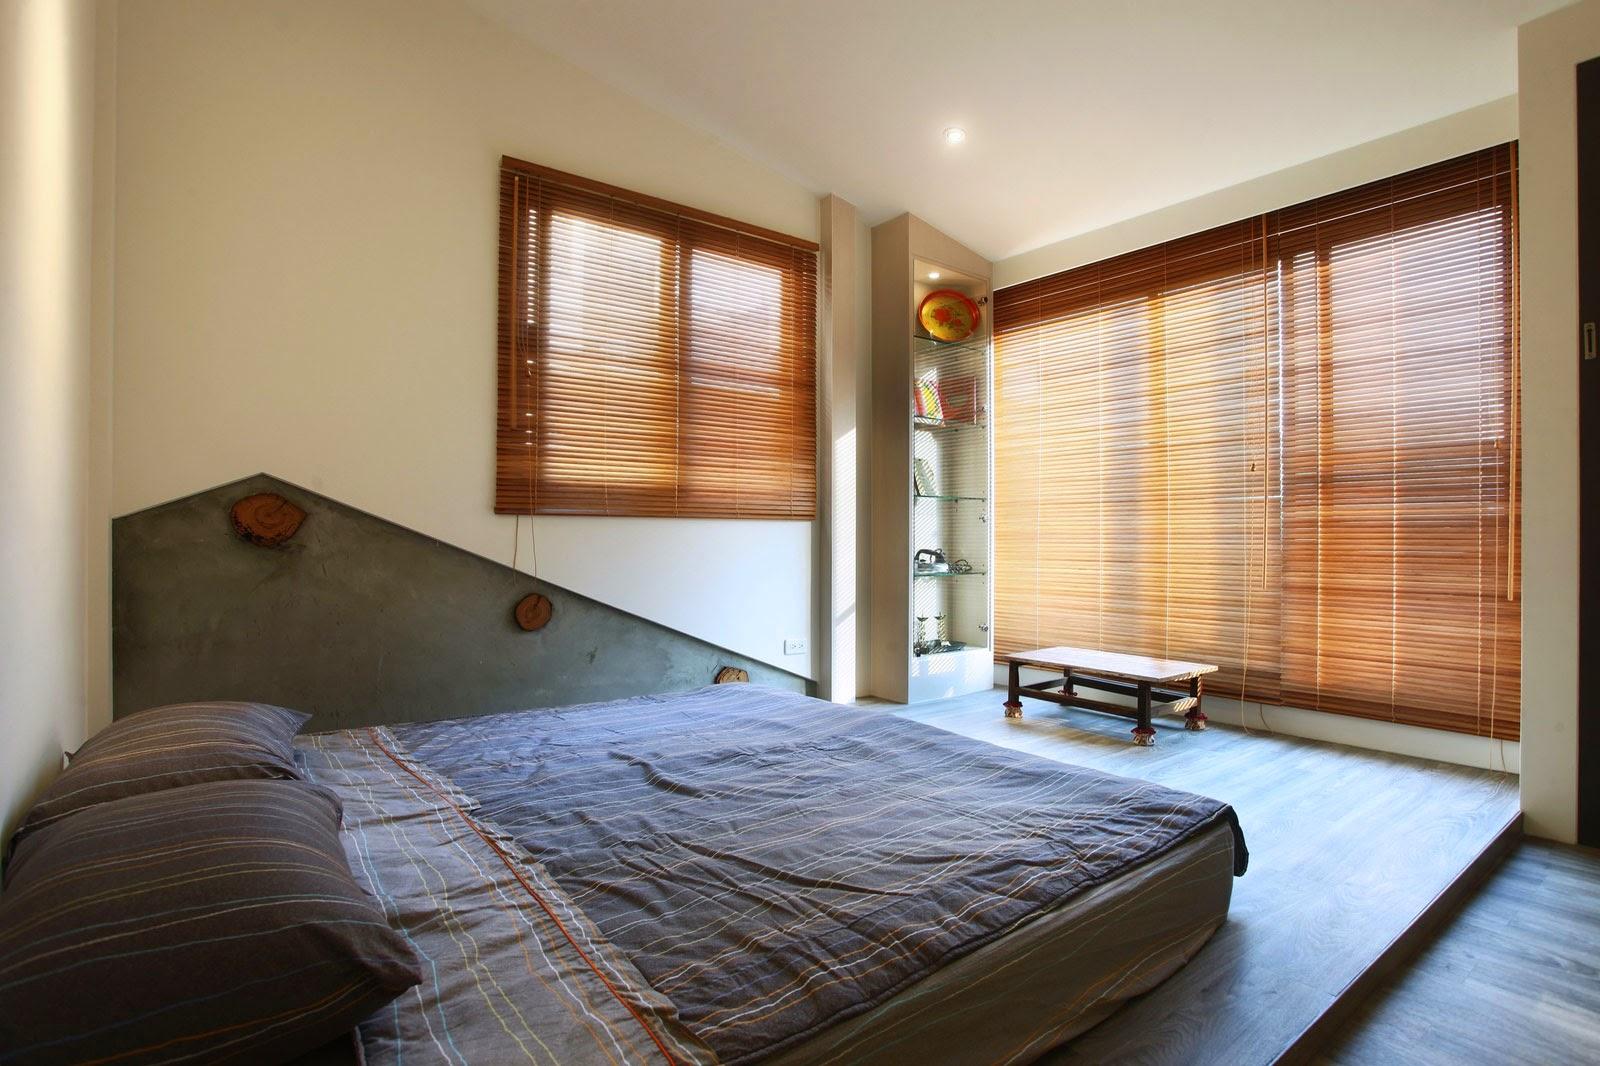 Concept-room-Minimalist-Modern-Bedroom